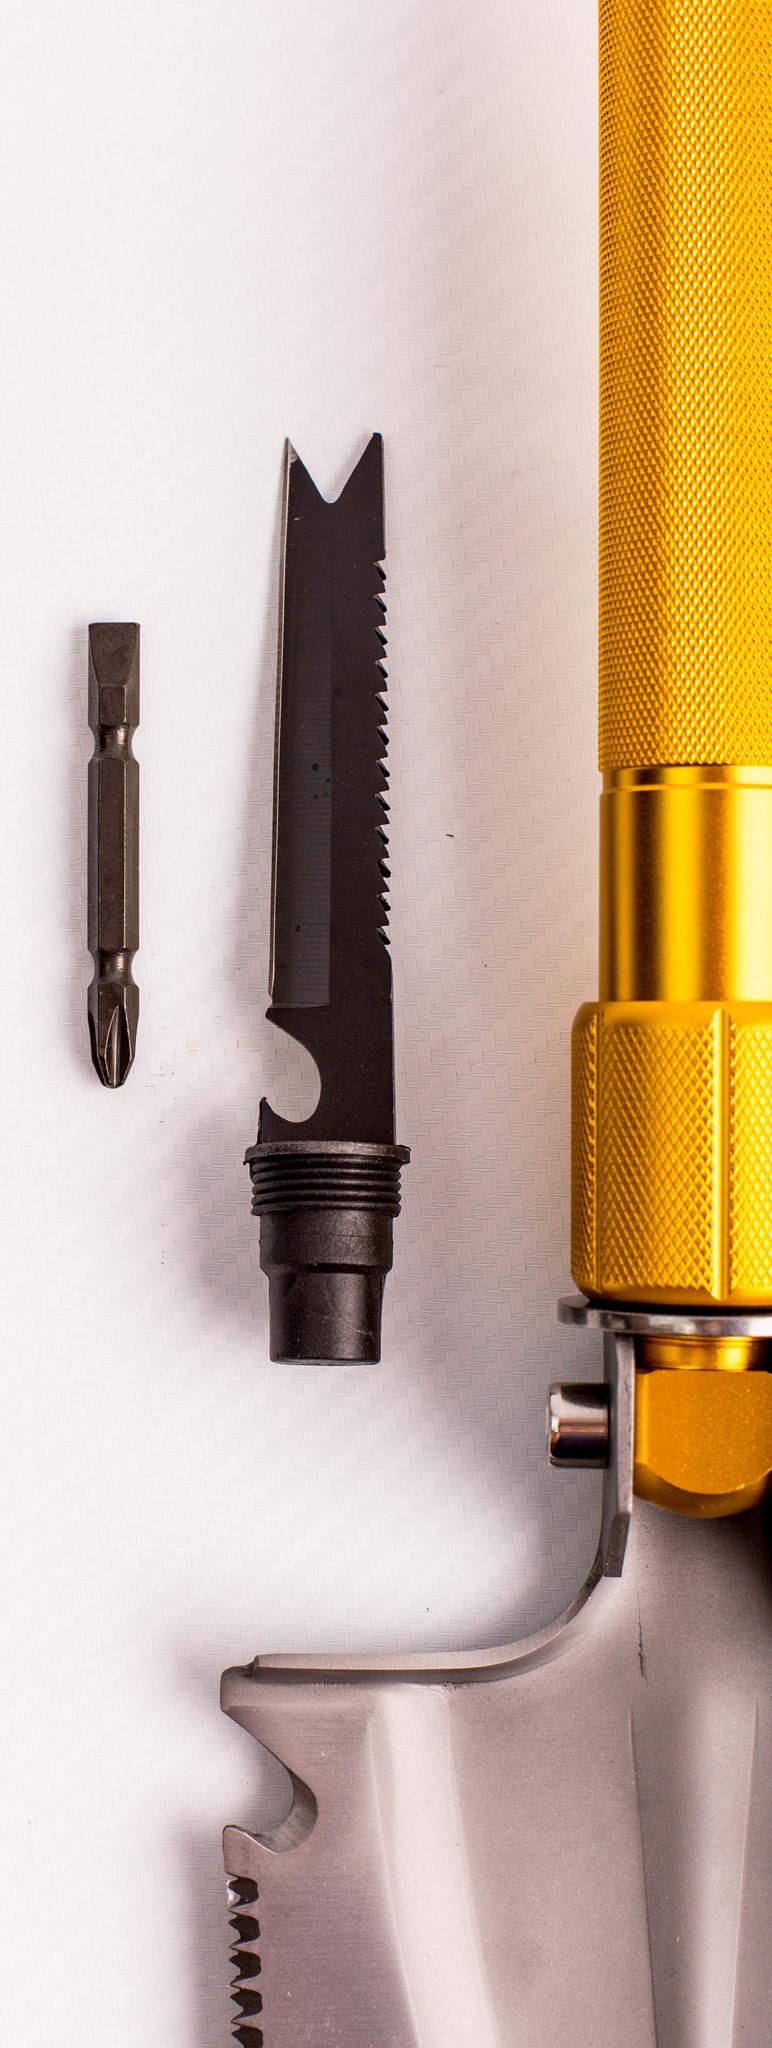 Фото 9 - Многофункциональная лопата, золотистая рукоятка от Noname